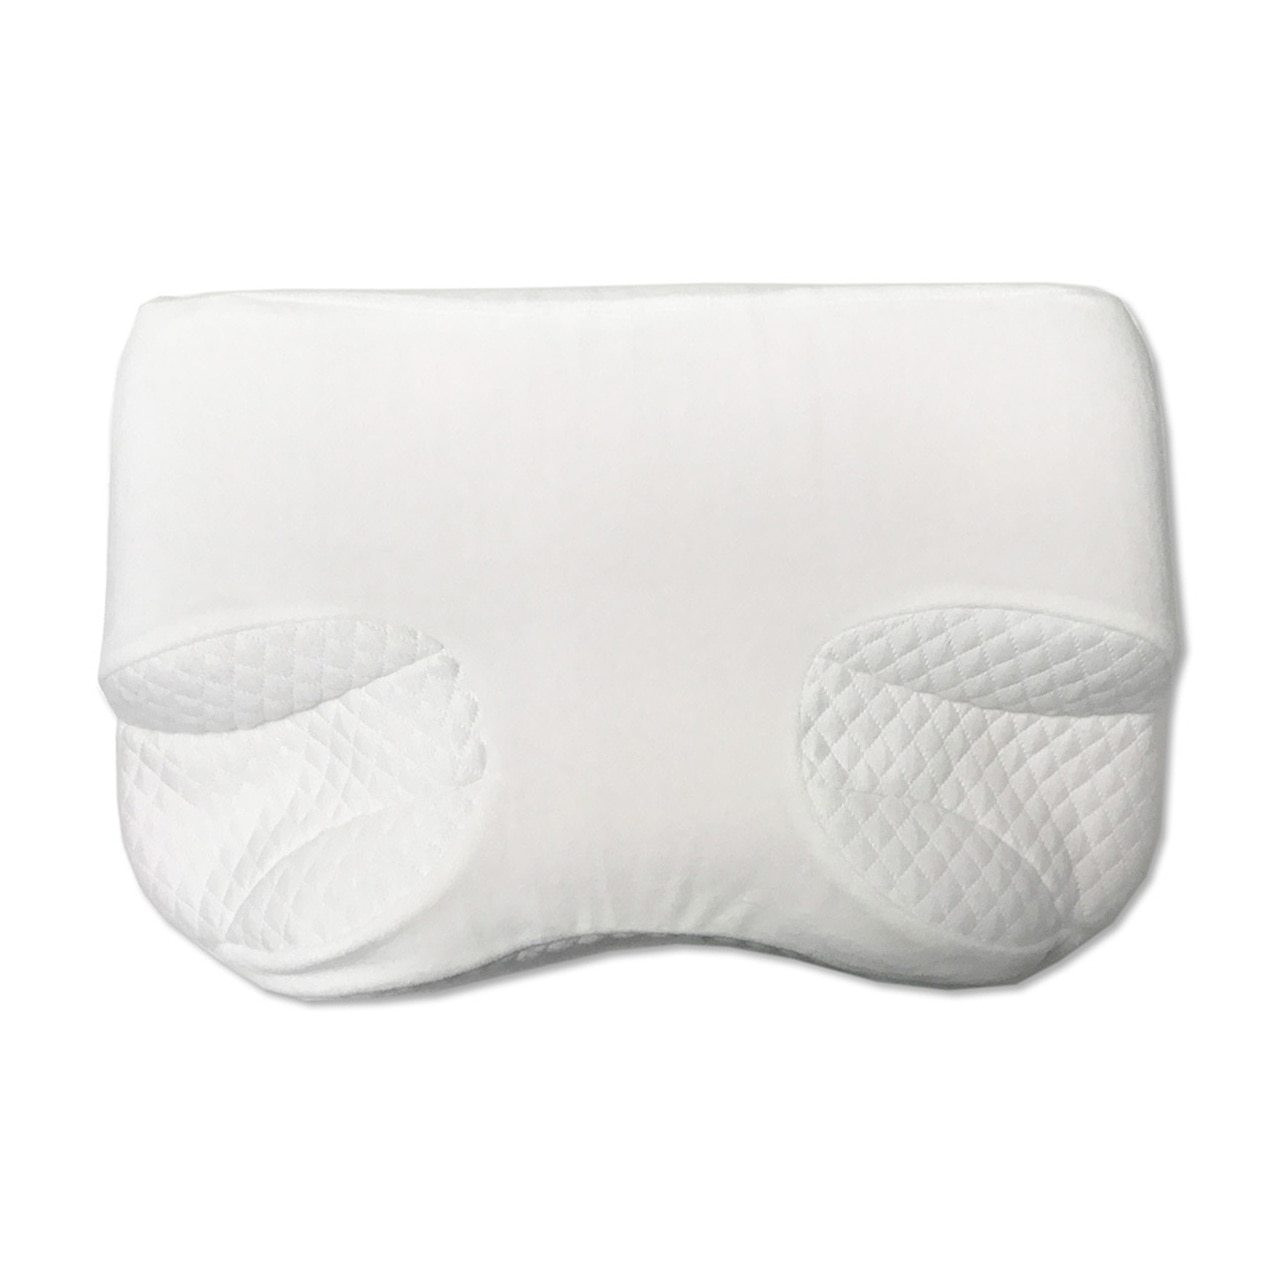 CPAP Australia | Sleep Apnea Machines, CPAP Masks & Supplies Online